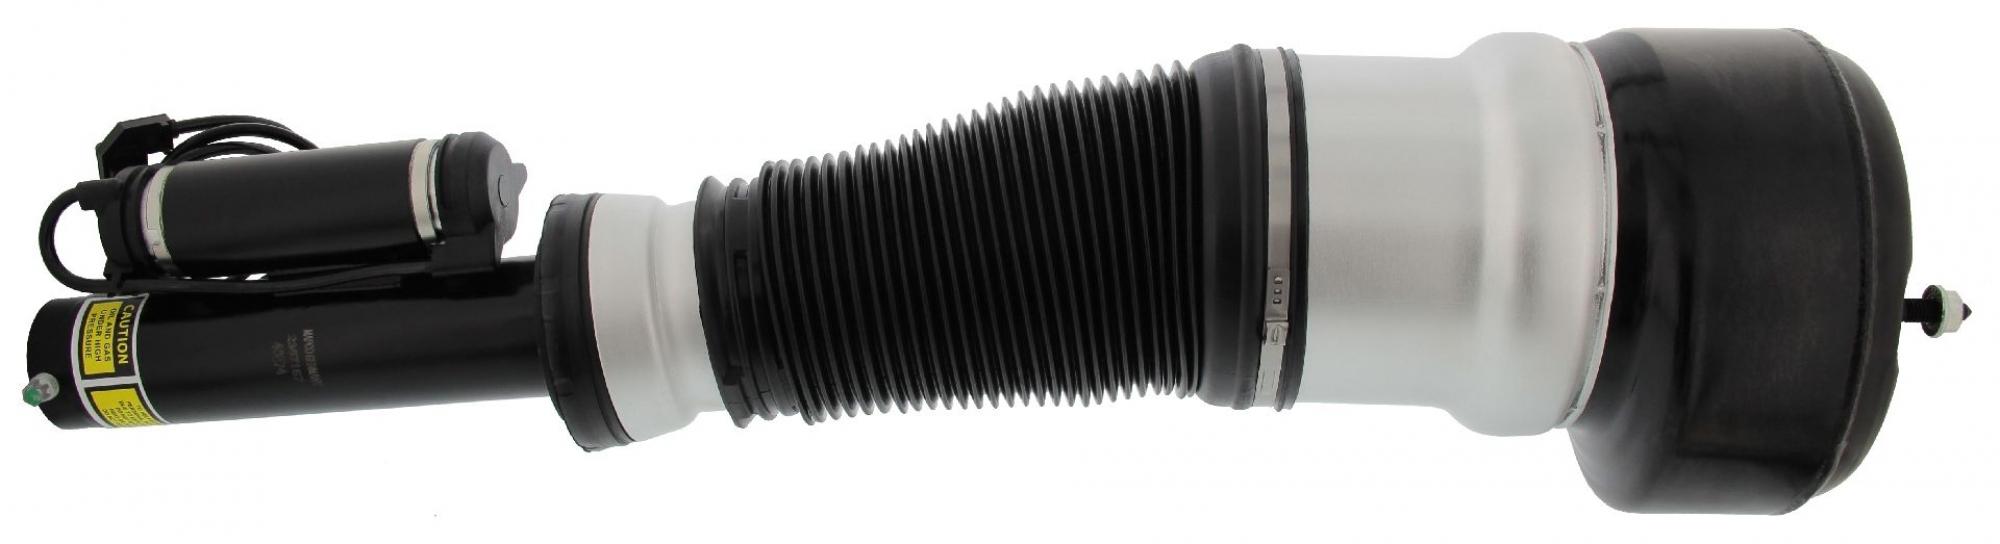 MAPCO 40874 Gamba elastica con ammortiz. pneumatico